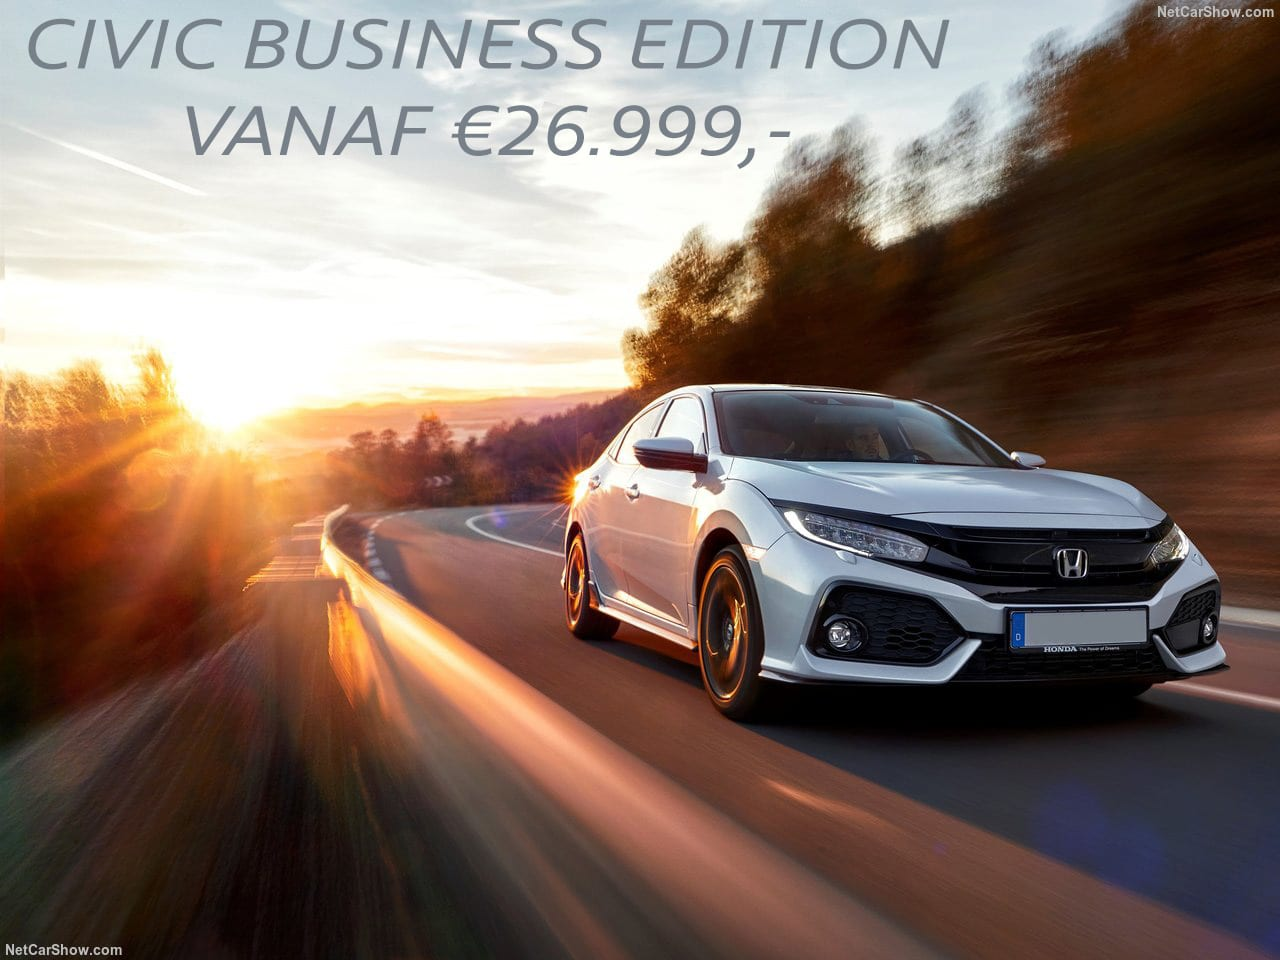 Honda Civic Business Edition